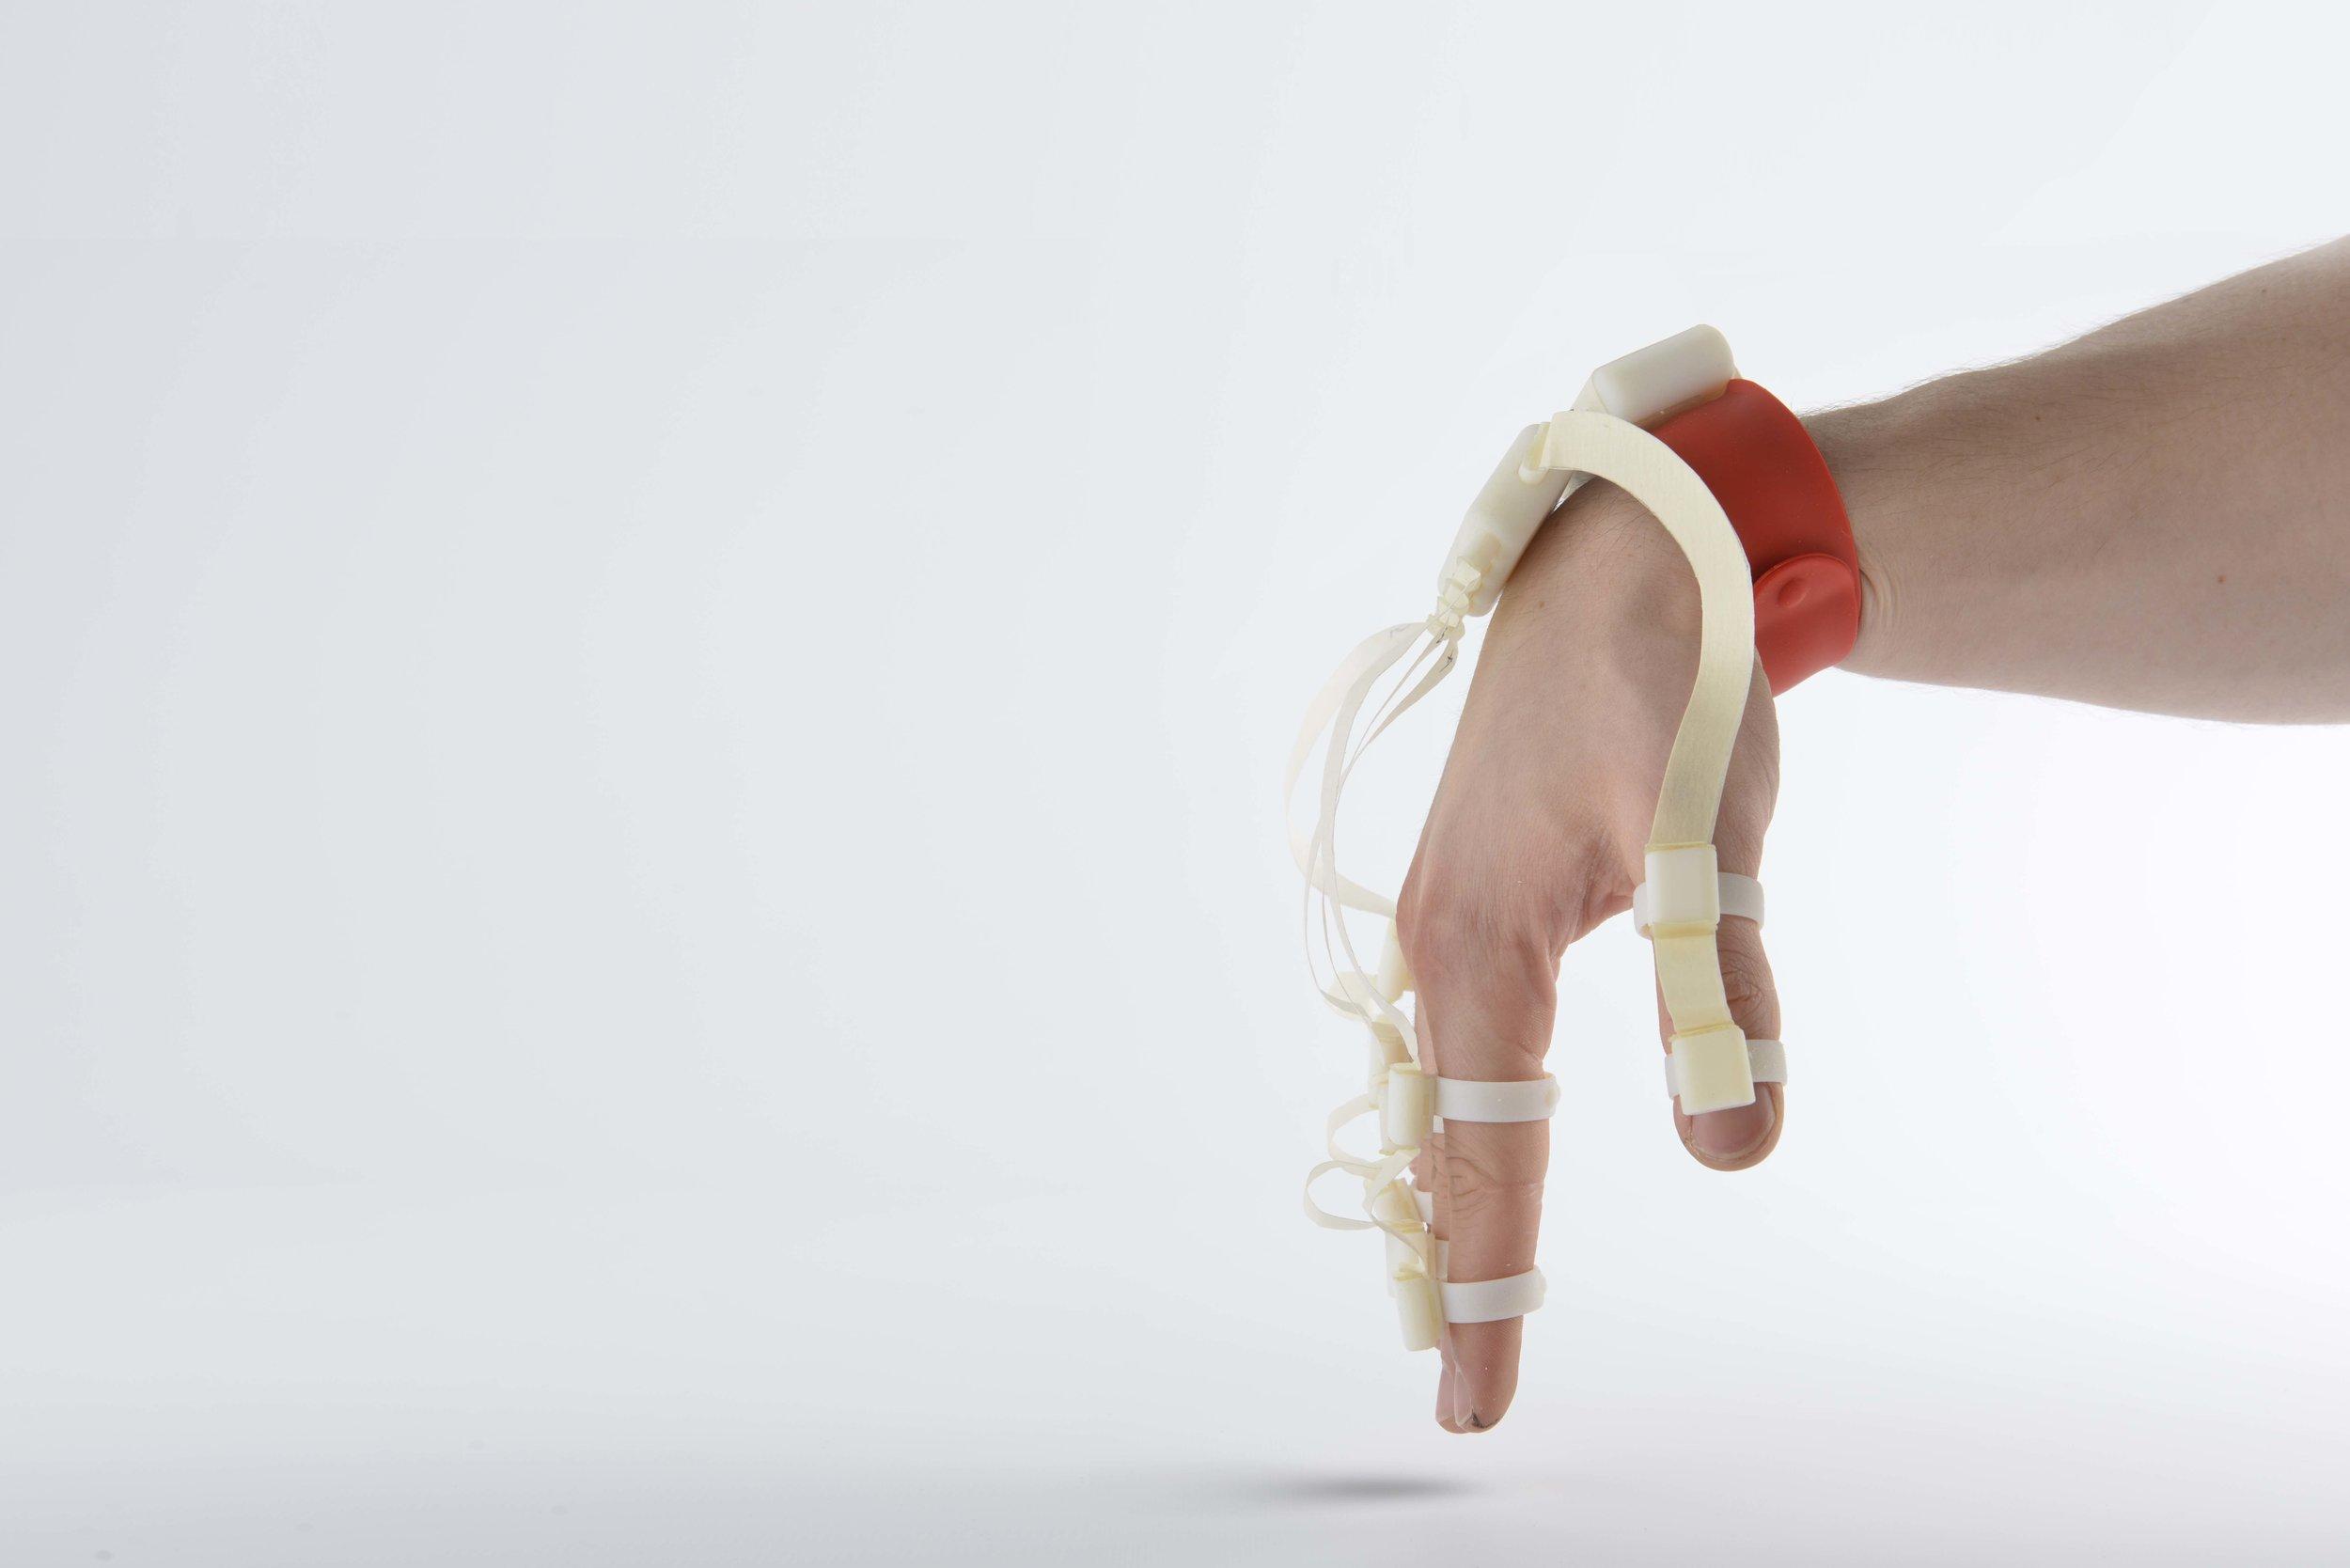 Hand flexibility rig_v03.jpg